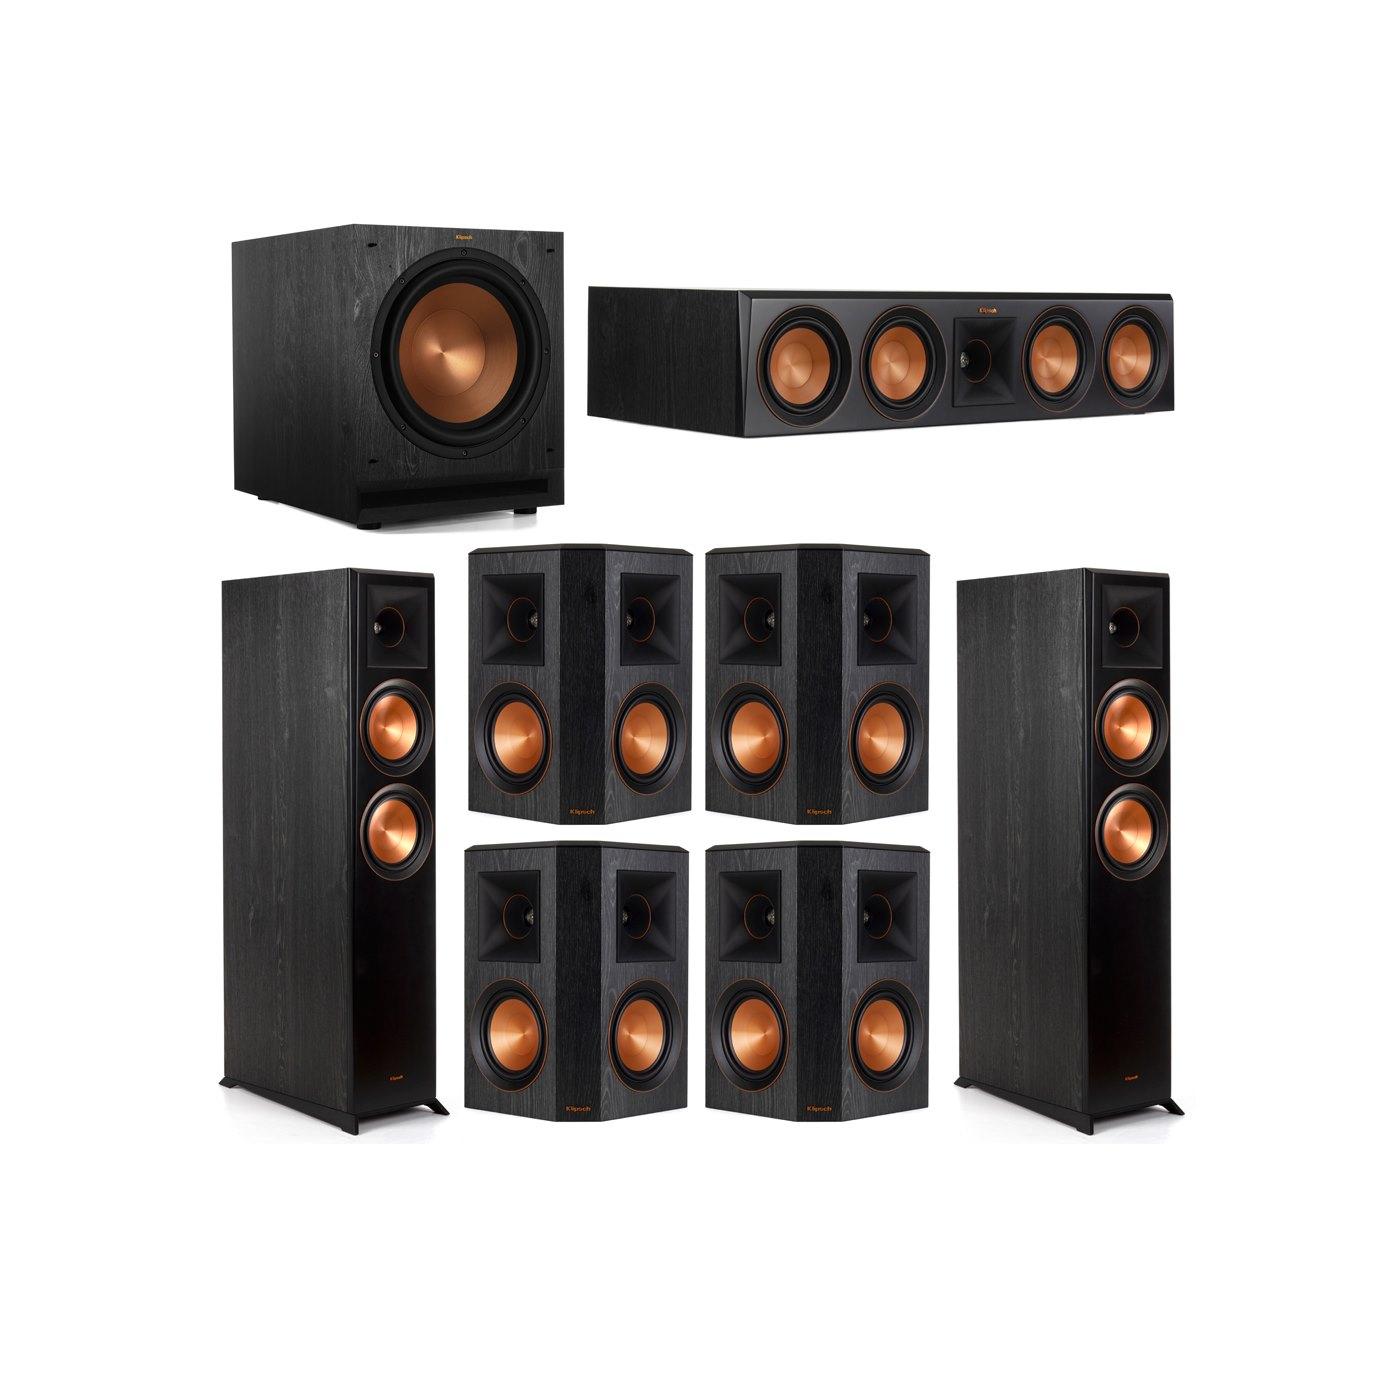 Klipsch 7.1 System with 2 RP-6000F Floorstanding Speakers, 1 Klipsch RP-504C Center Speaker, 4 Klipsch RP-502S Surround Speakers, 1 Klipsch SPL-120 Subwoofer